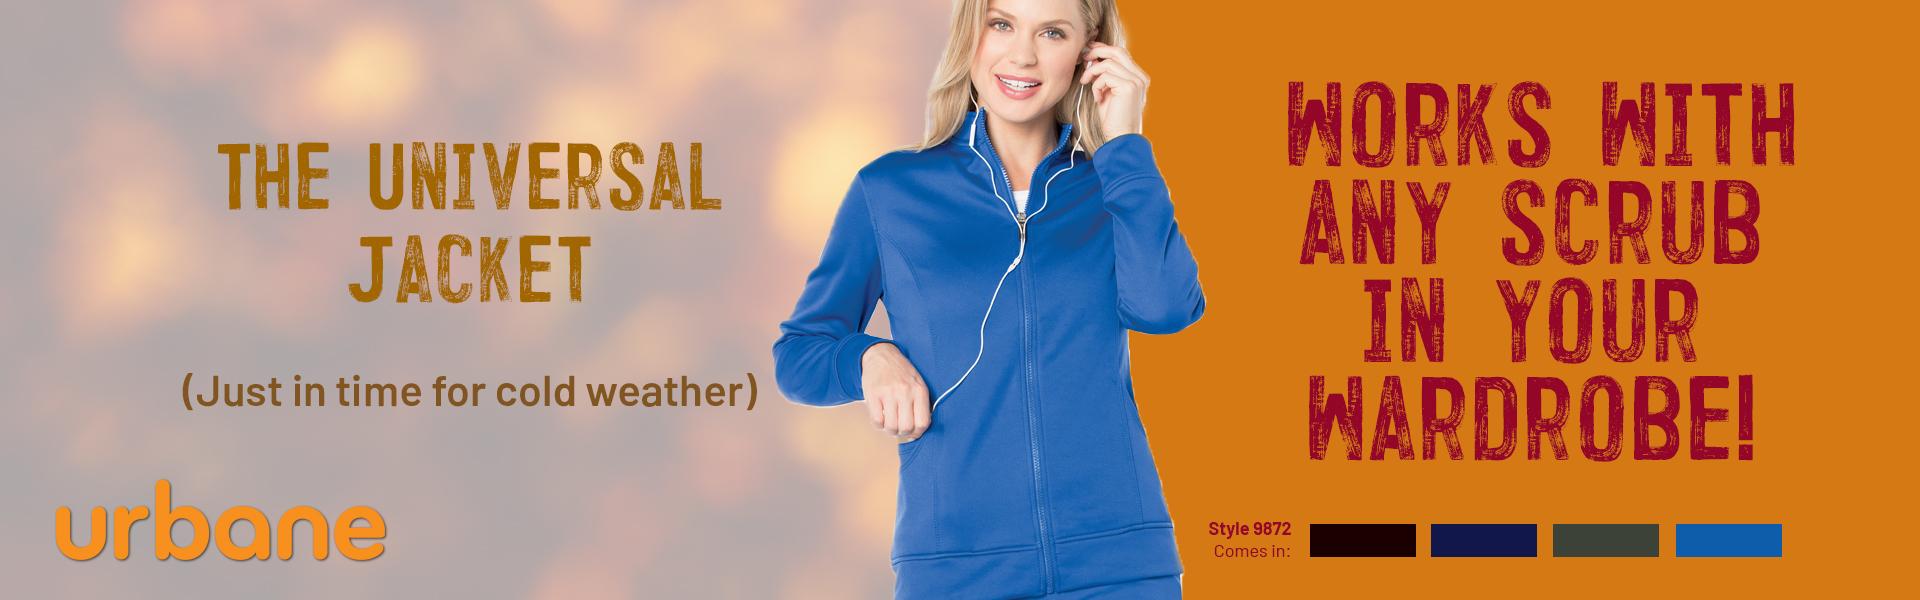 universal-jacket-9872-banner-net.jpg